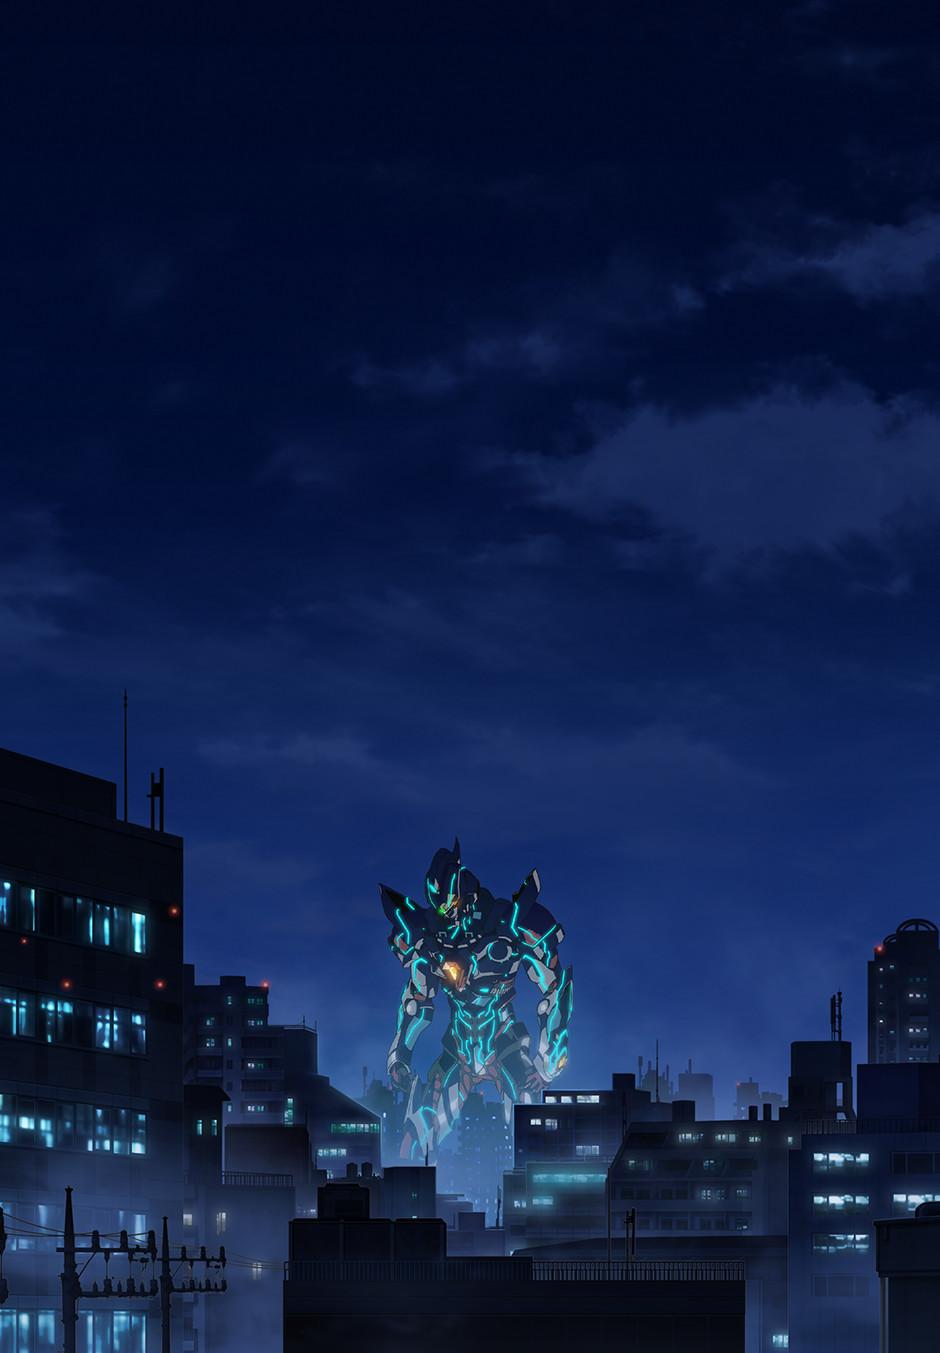 Tvアニメ Ssss Gridman 公式サイト